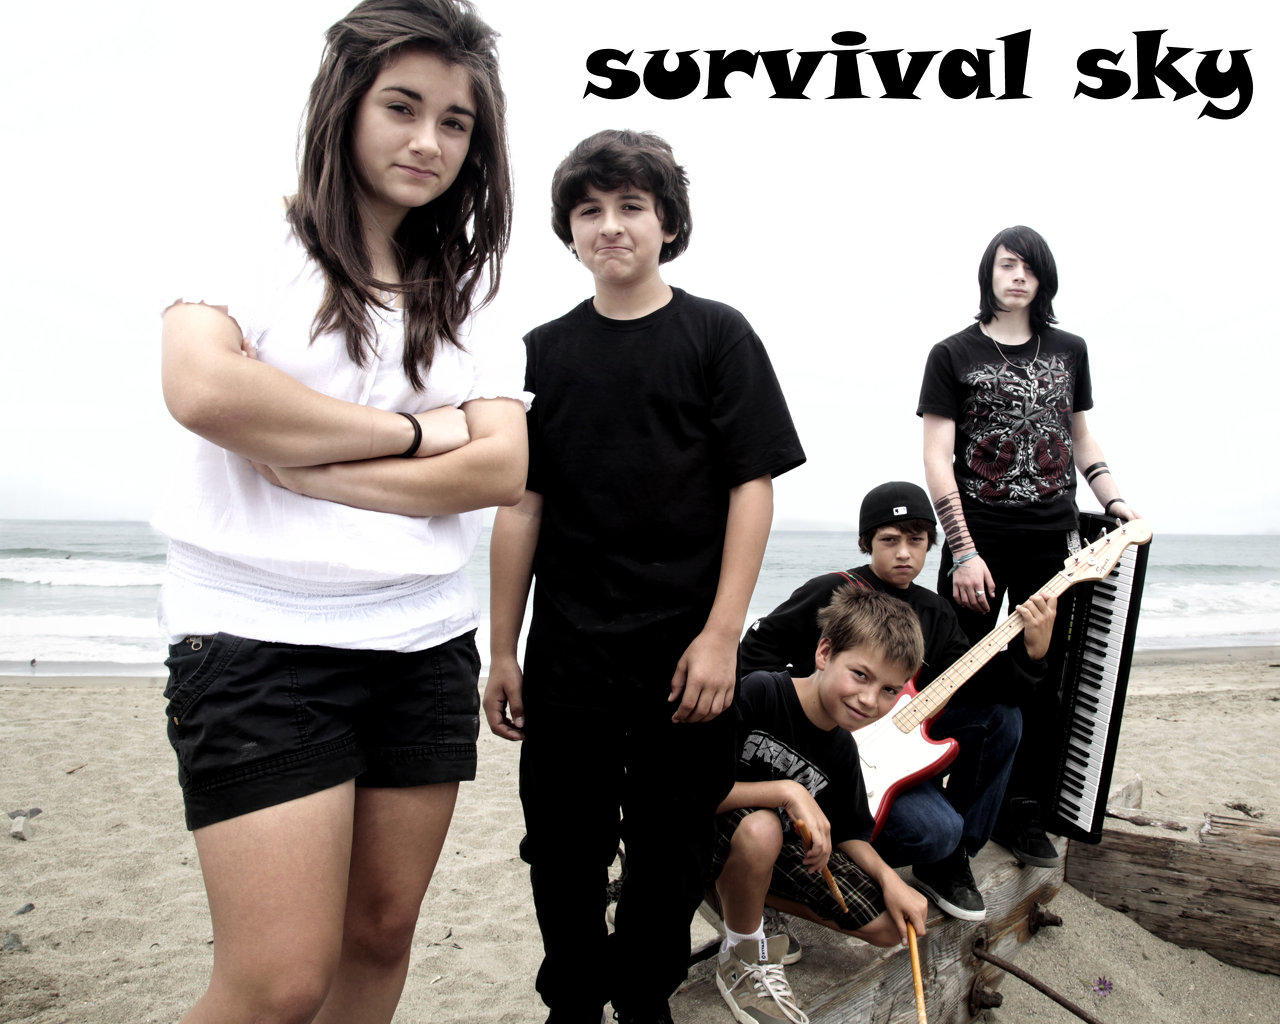 SurvivalSky.jpg